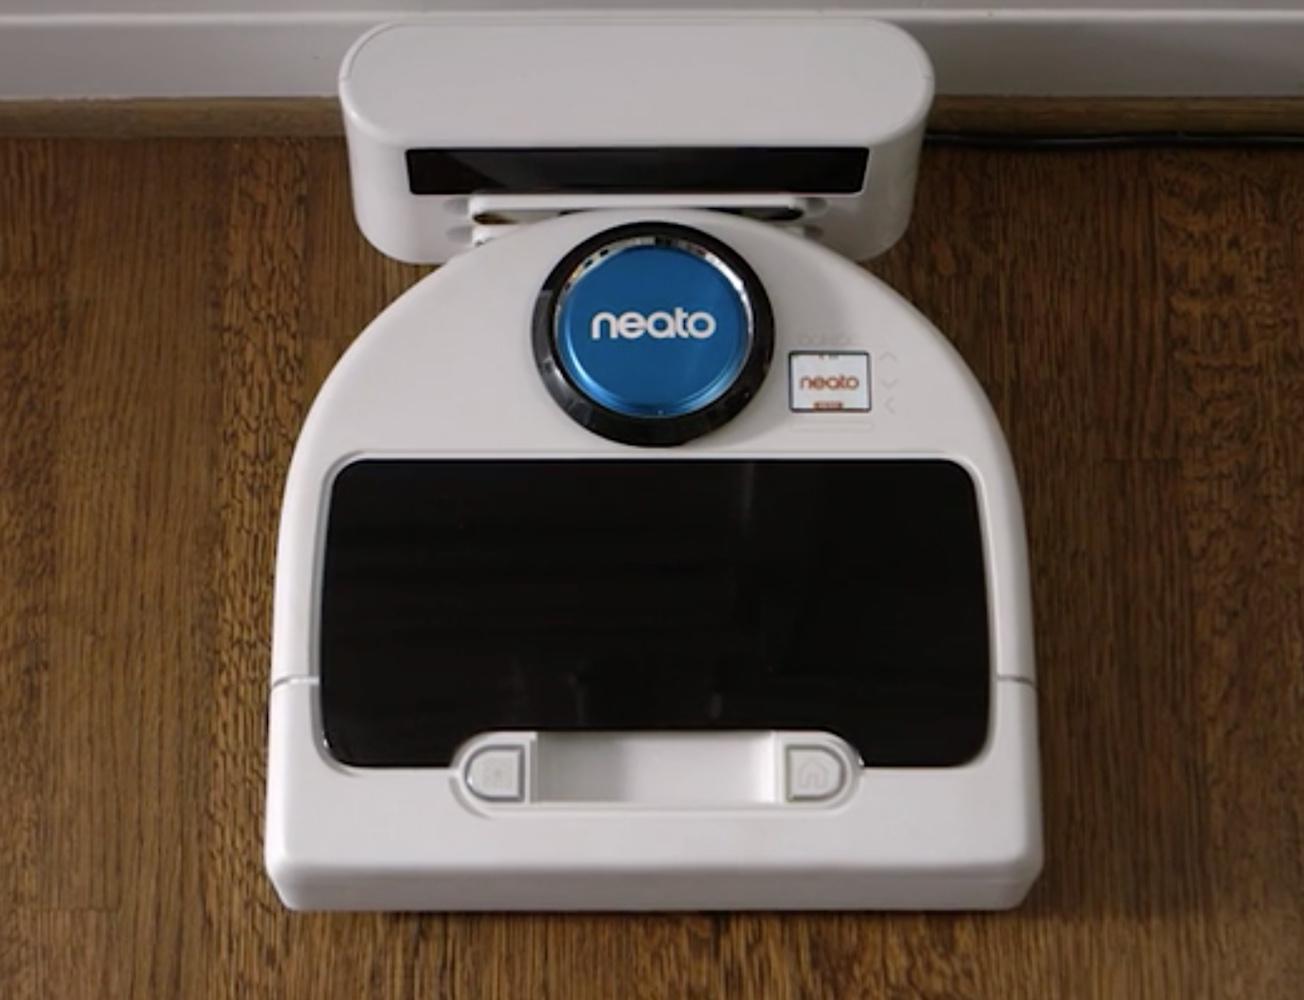 Neato Botvac D Series Robot Vacuum Cleaner